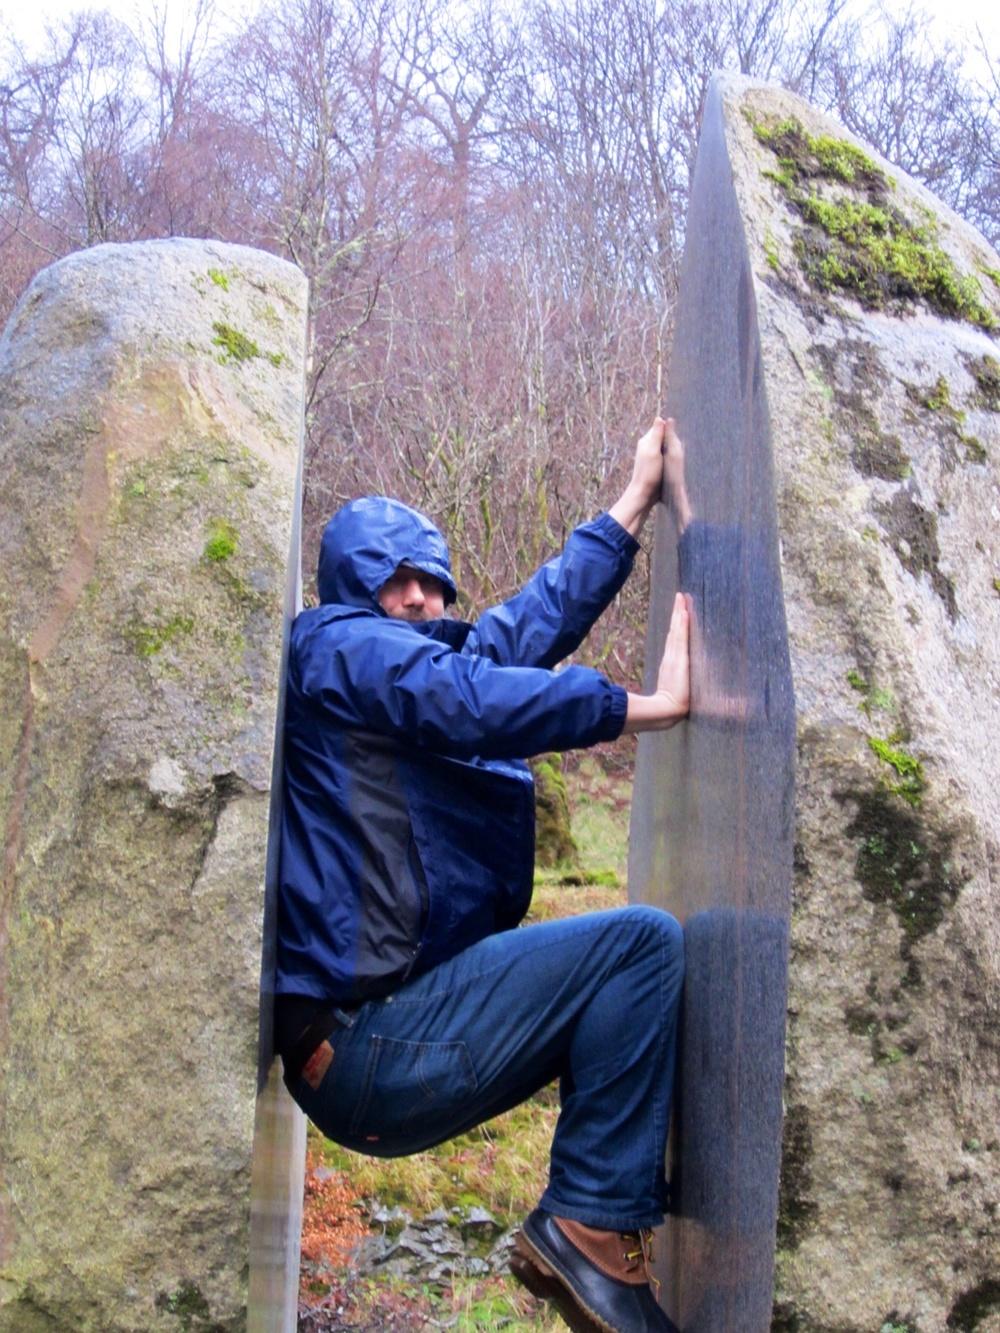 Bill Rock Climbing, Ft William, Scotland